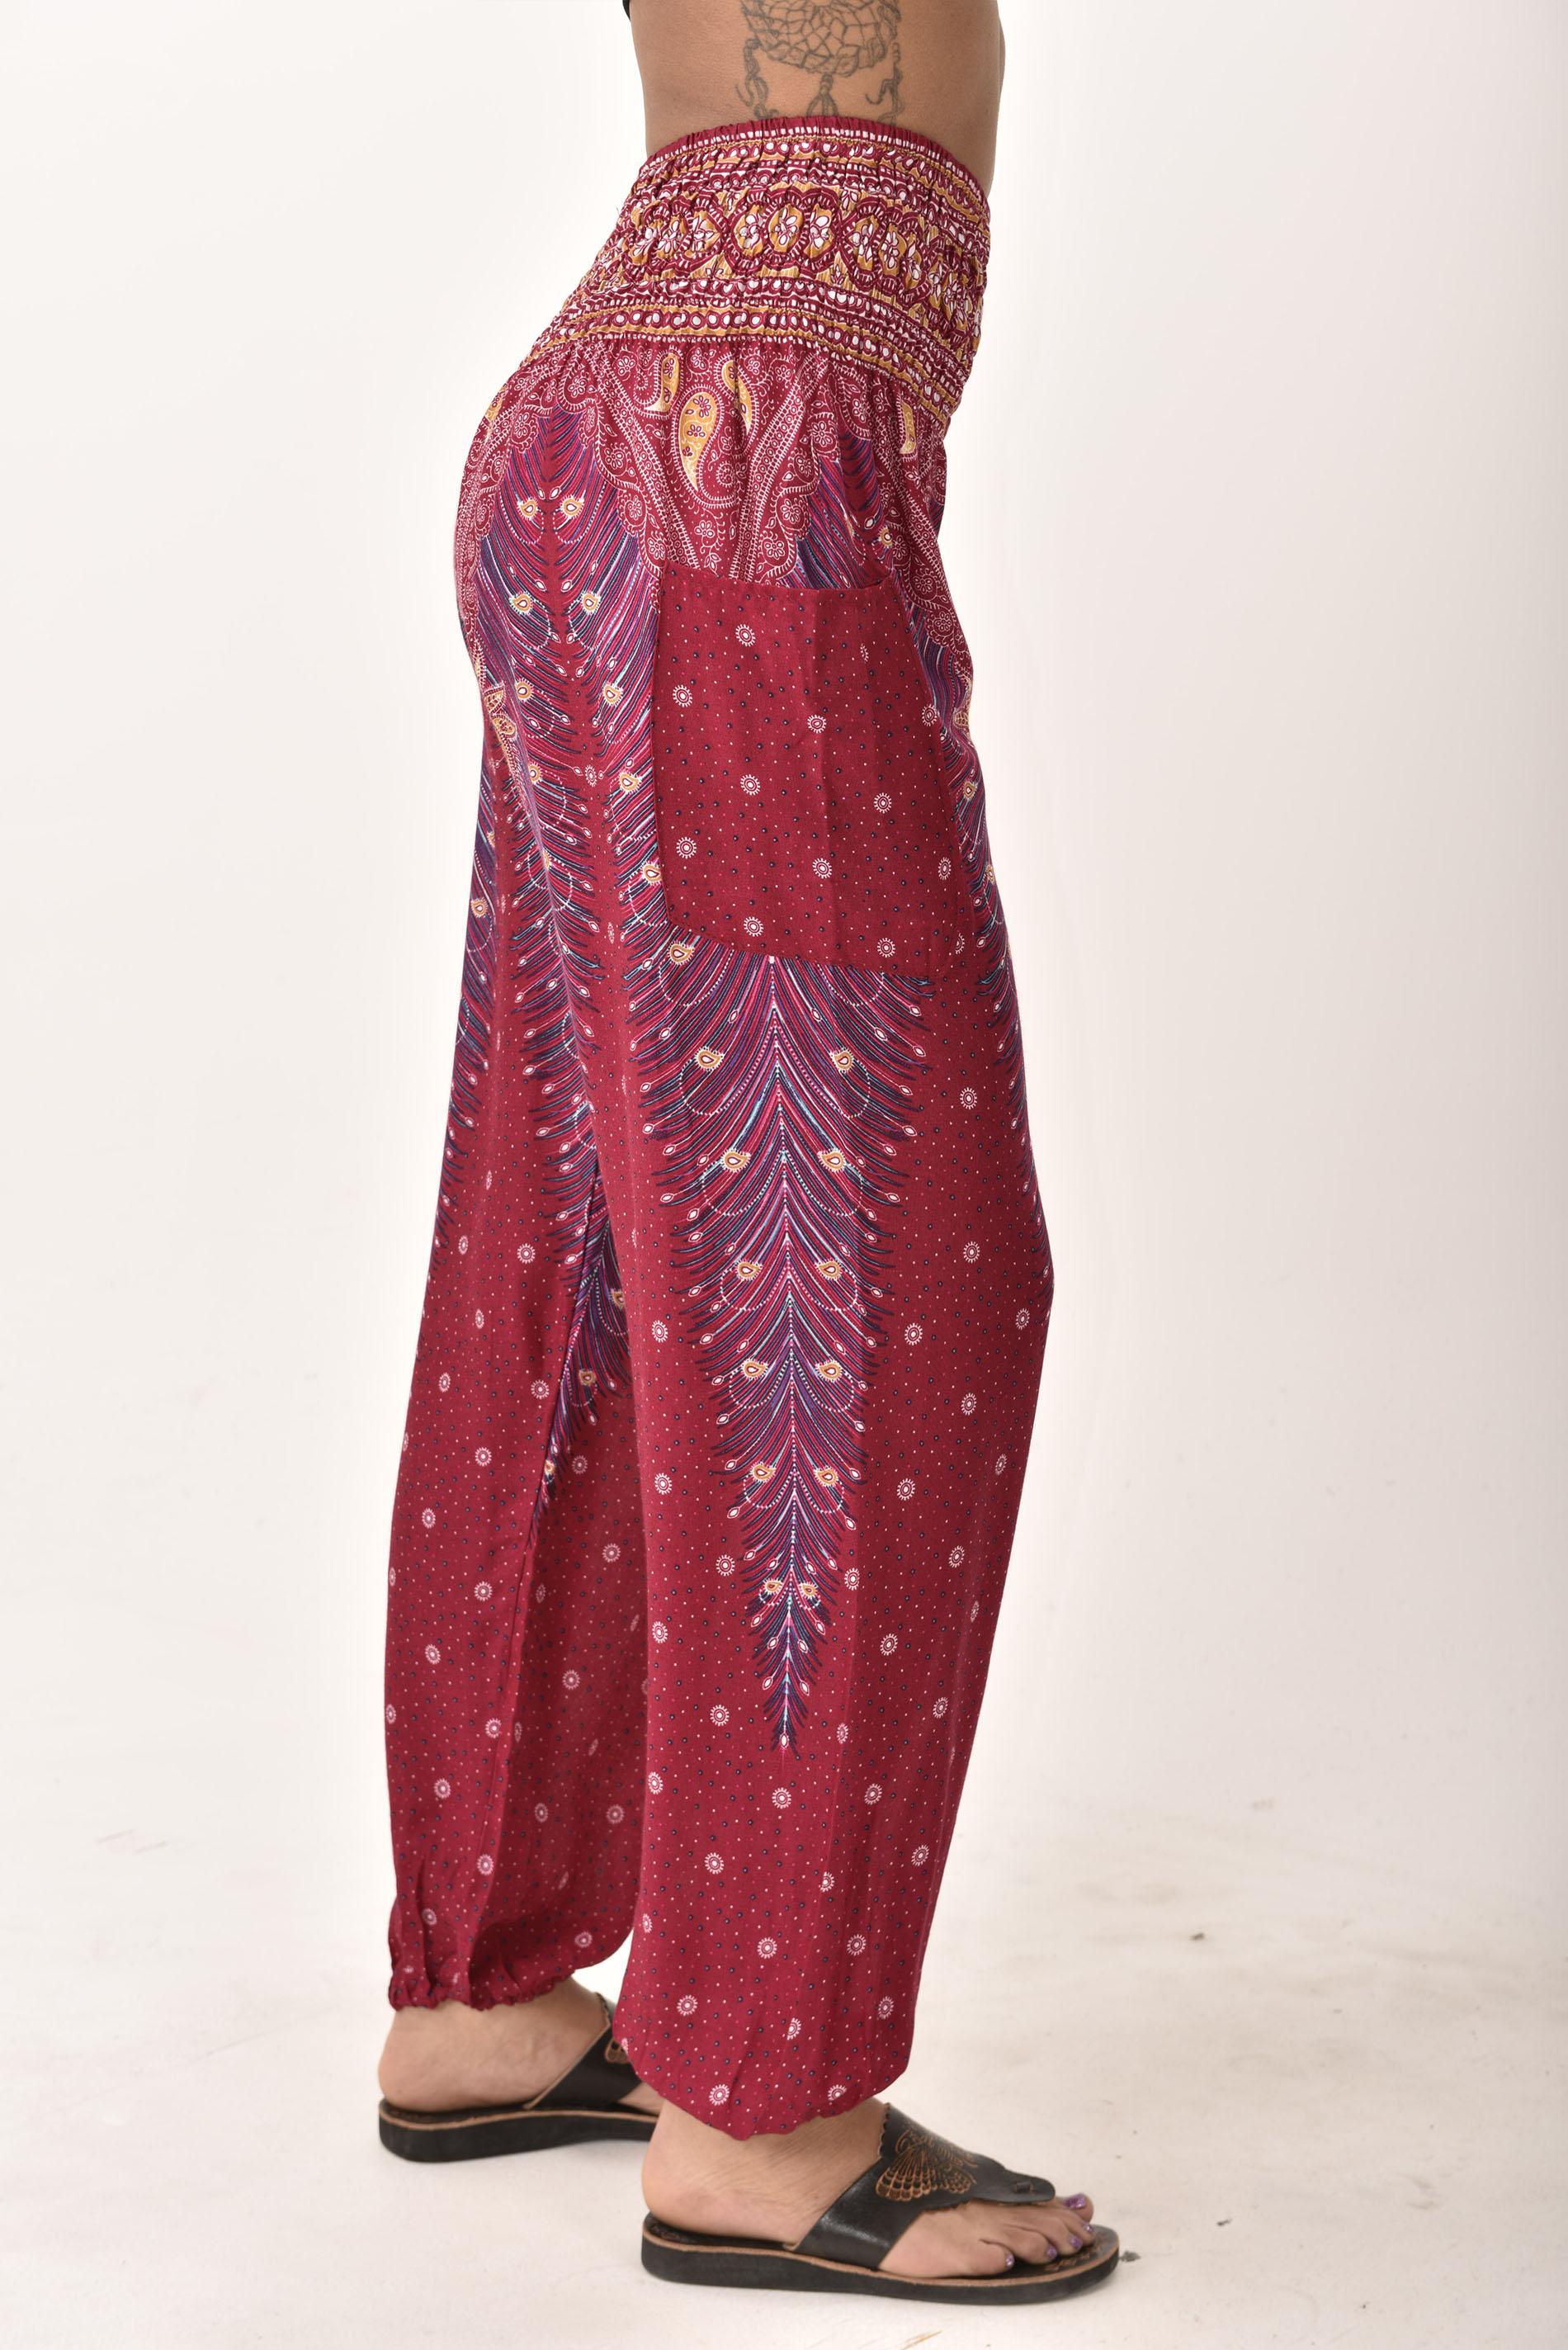 Smocked Waist Pants, Peacock Print, Red